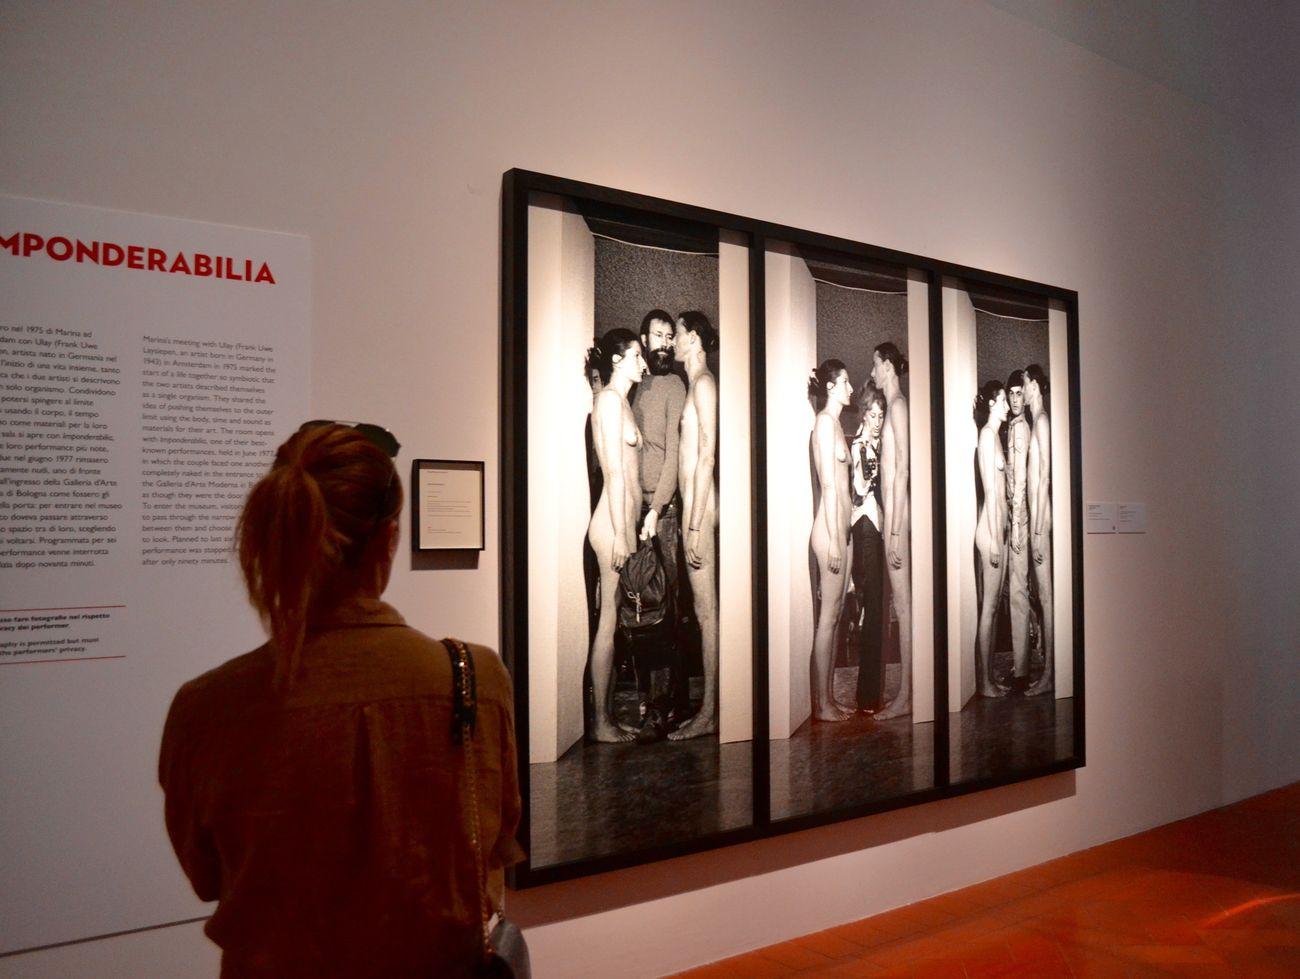 Marina Abramović & Ulay, Imponderabilia, Marina and Ulay, 1975. Installation view at Palazzo Strozzi, Firenze 2018